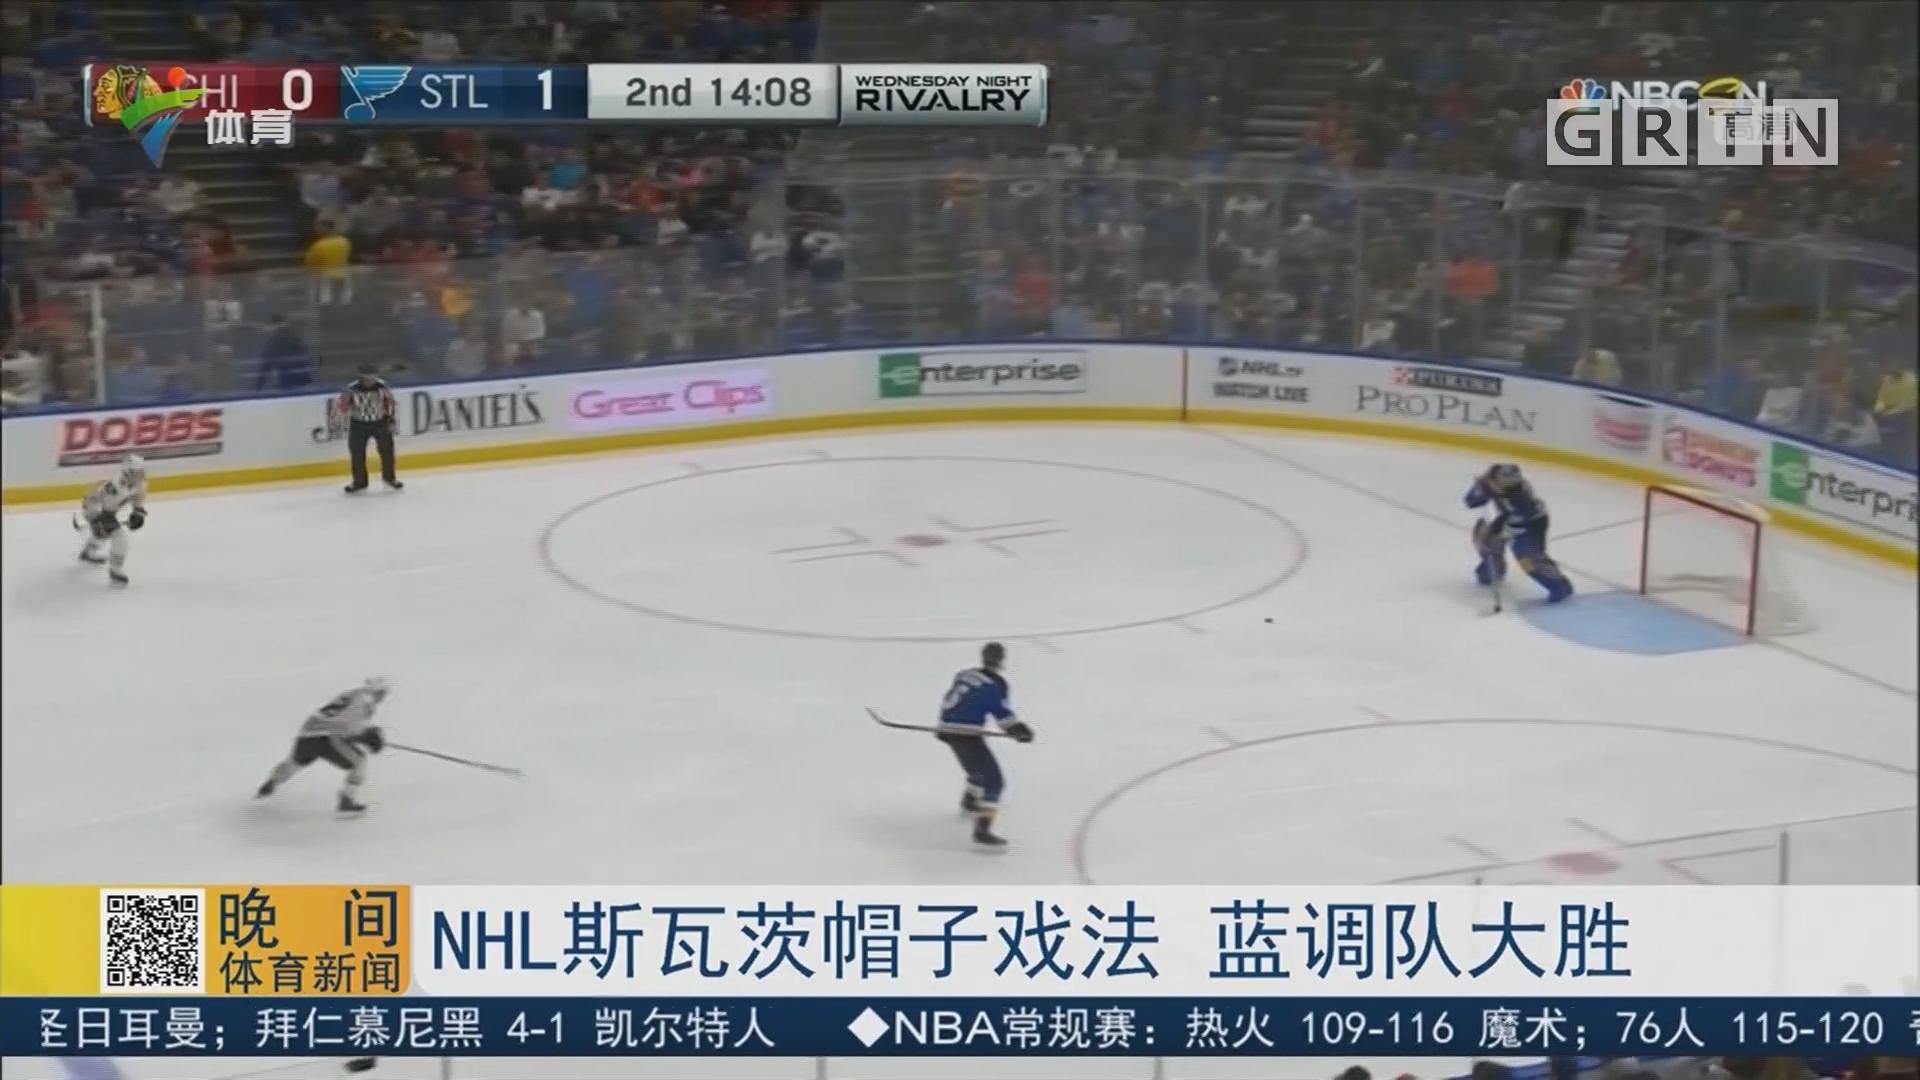 NHL斯瓦茨帽子戏法 蓝调队大胜